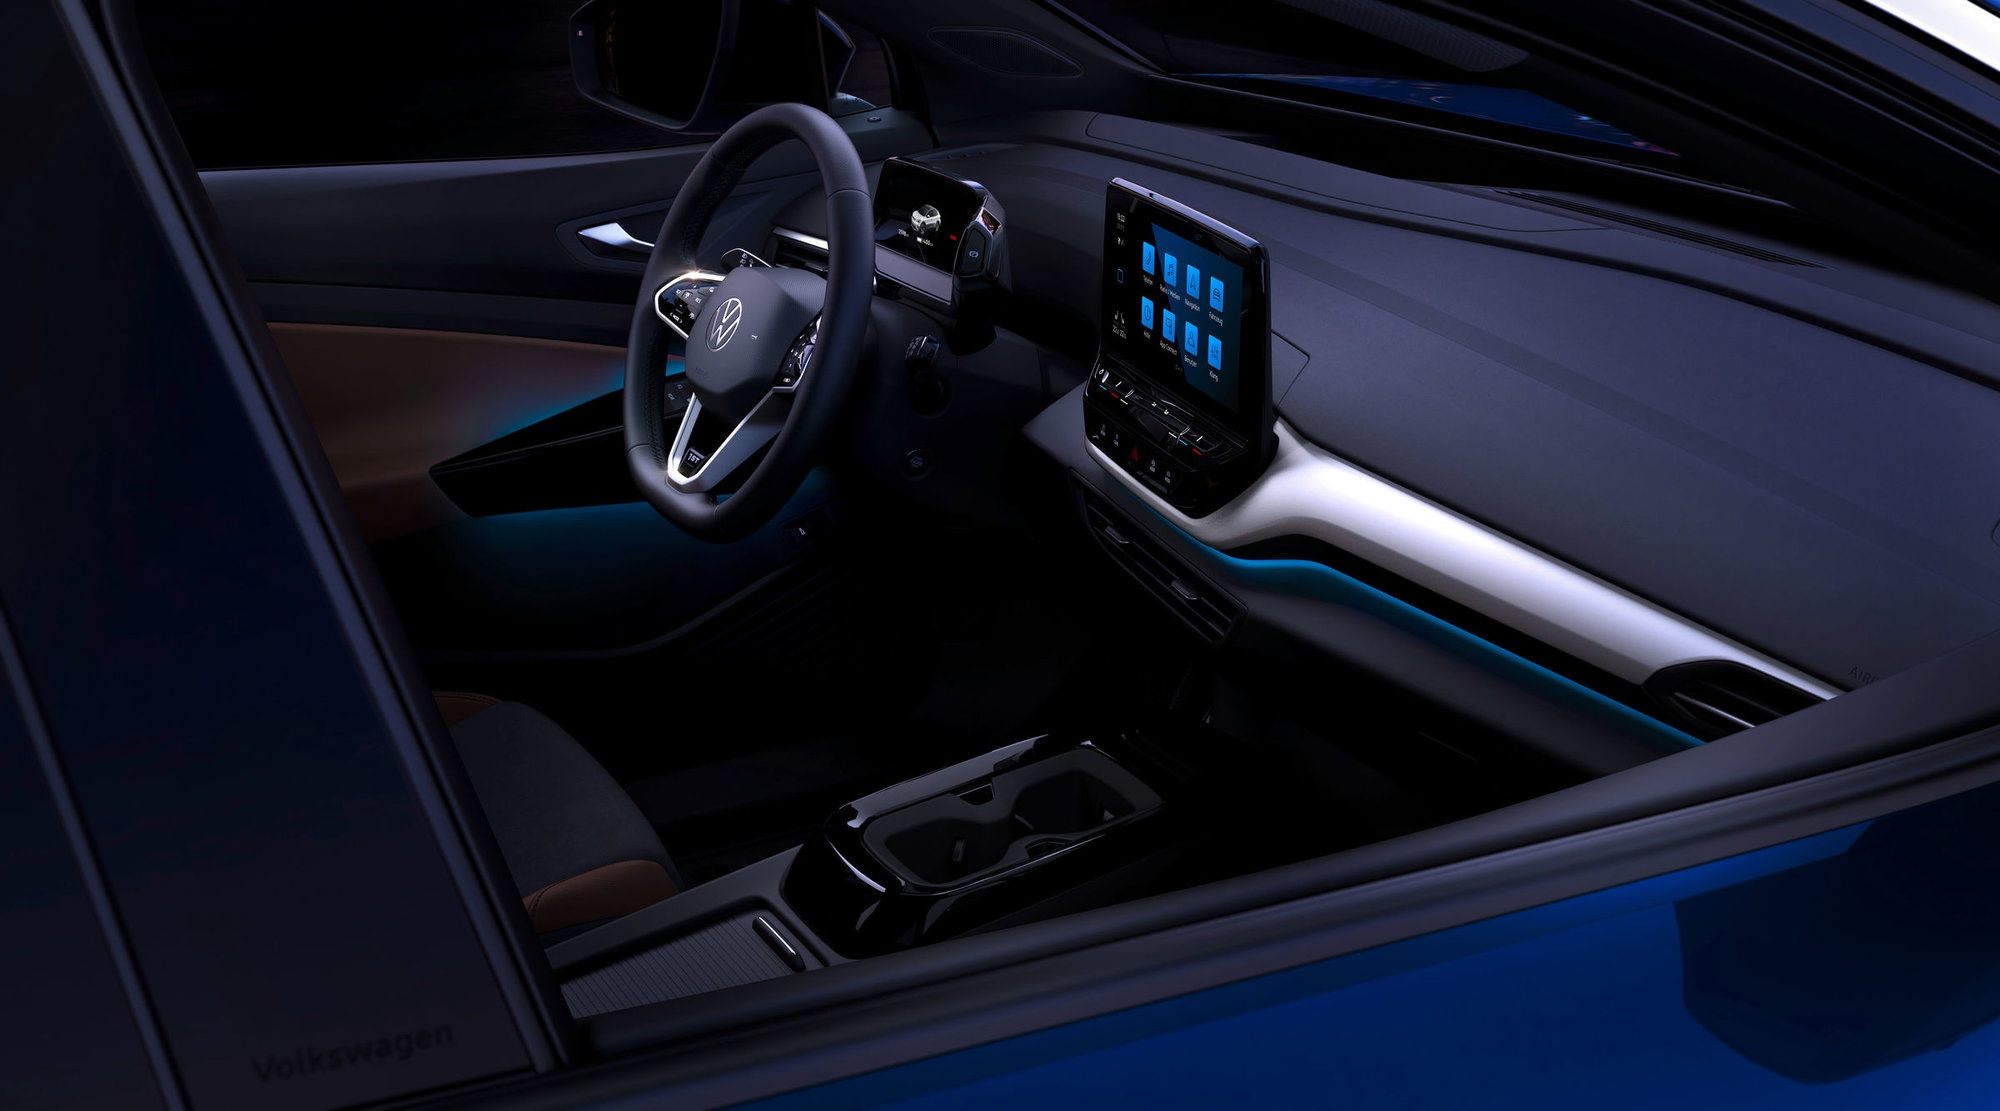 Volkswagen prozradil podrobnosti o interiéru připravovaného SUV ID.4